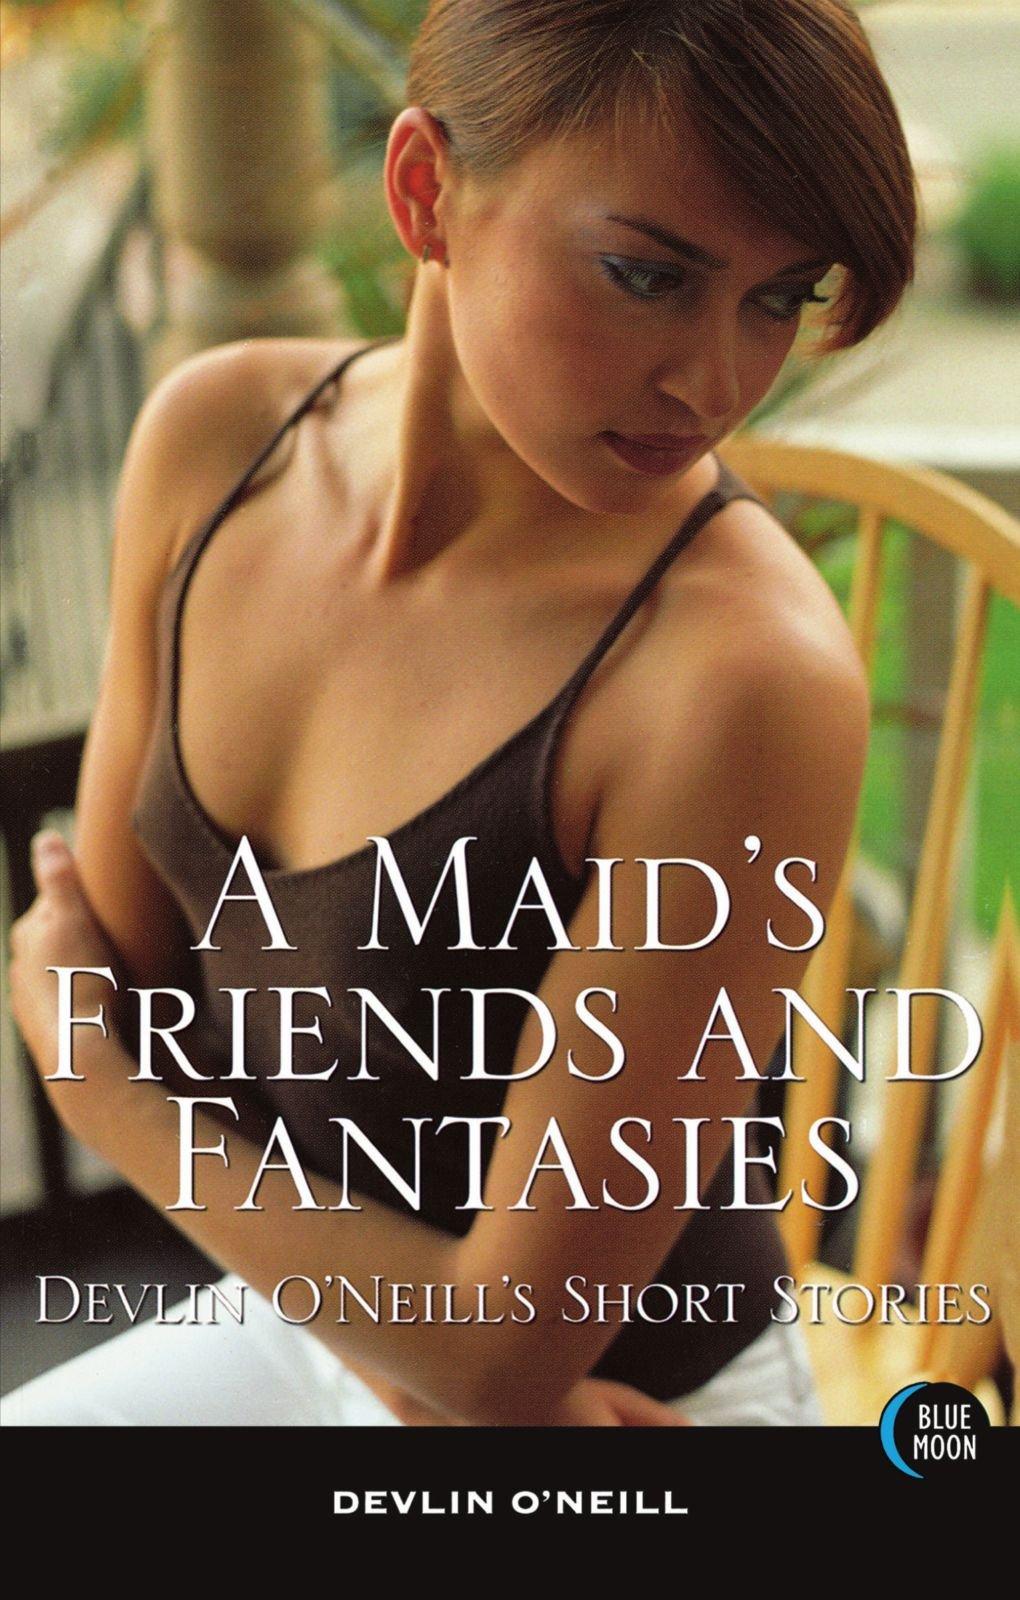 Rachel mcadams nude movie